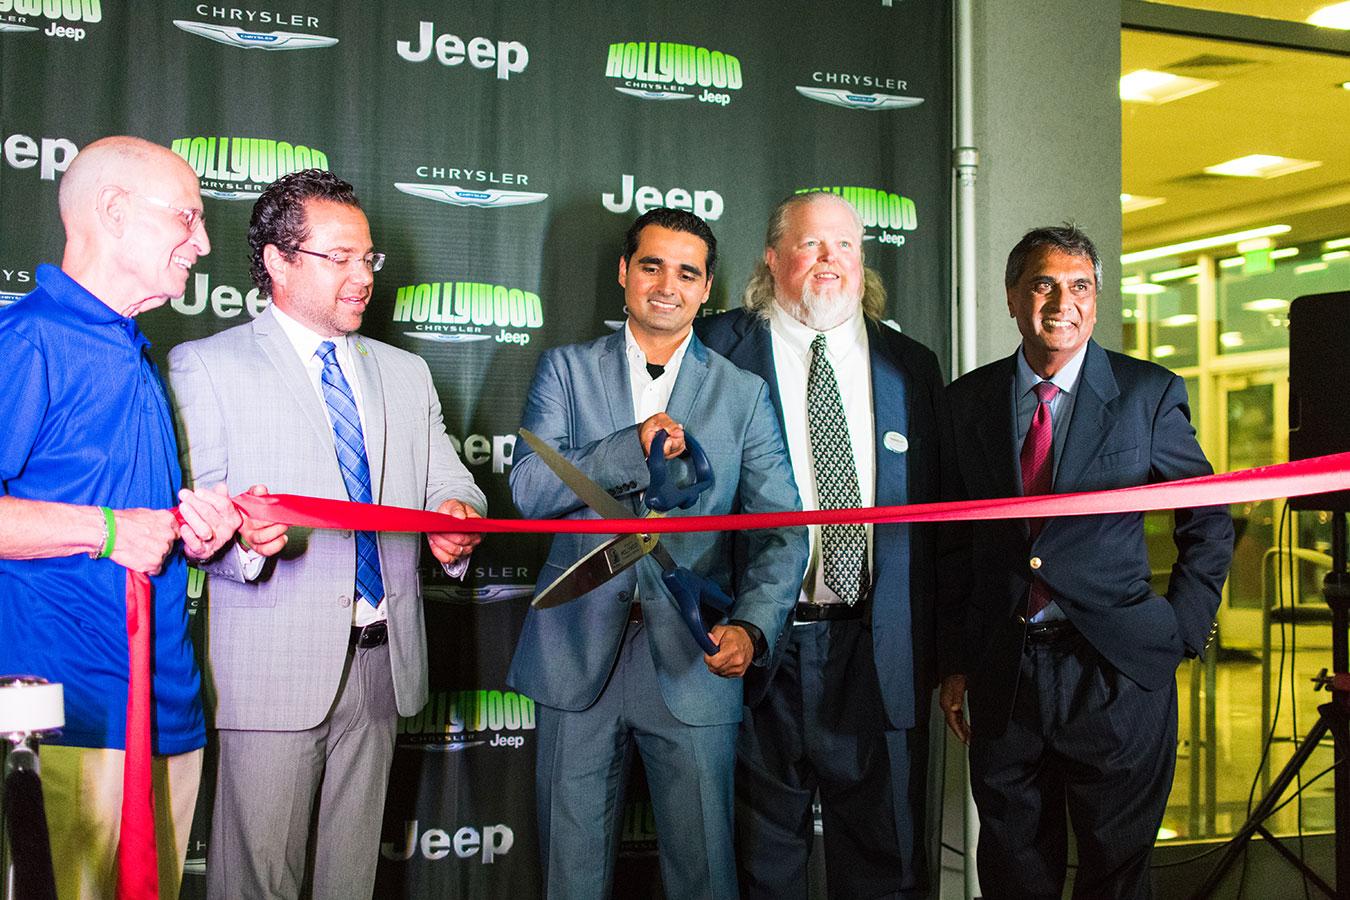 jeeps sahara new jl sale hollywood wrangler jeep vehicles chrysler for